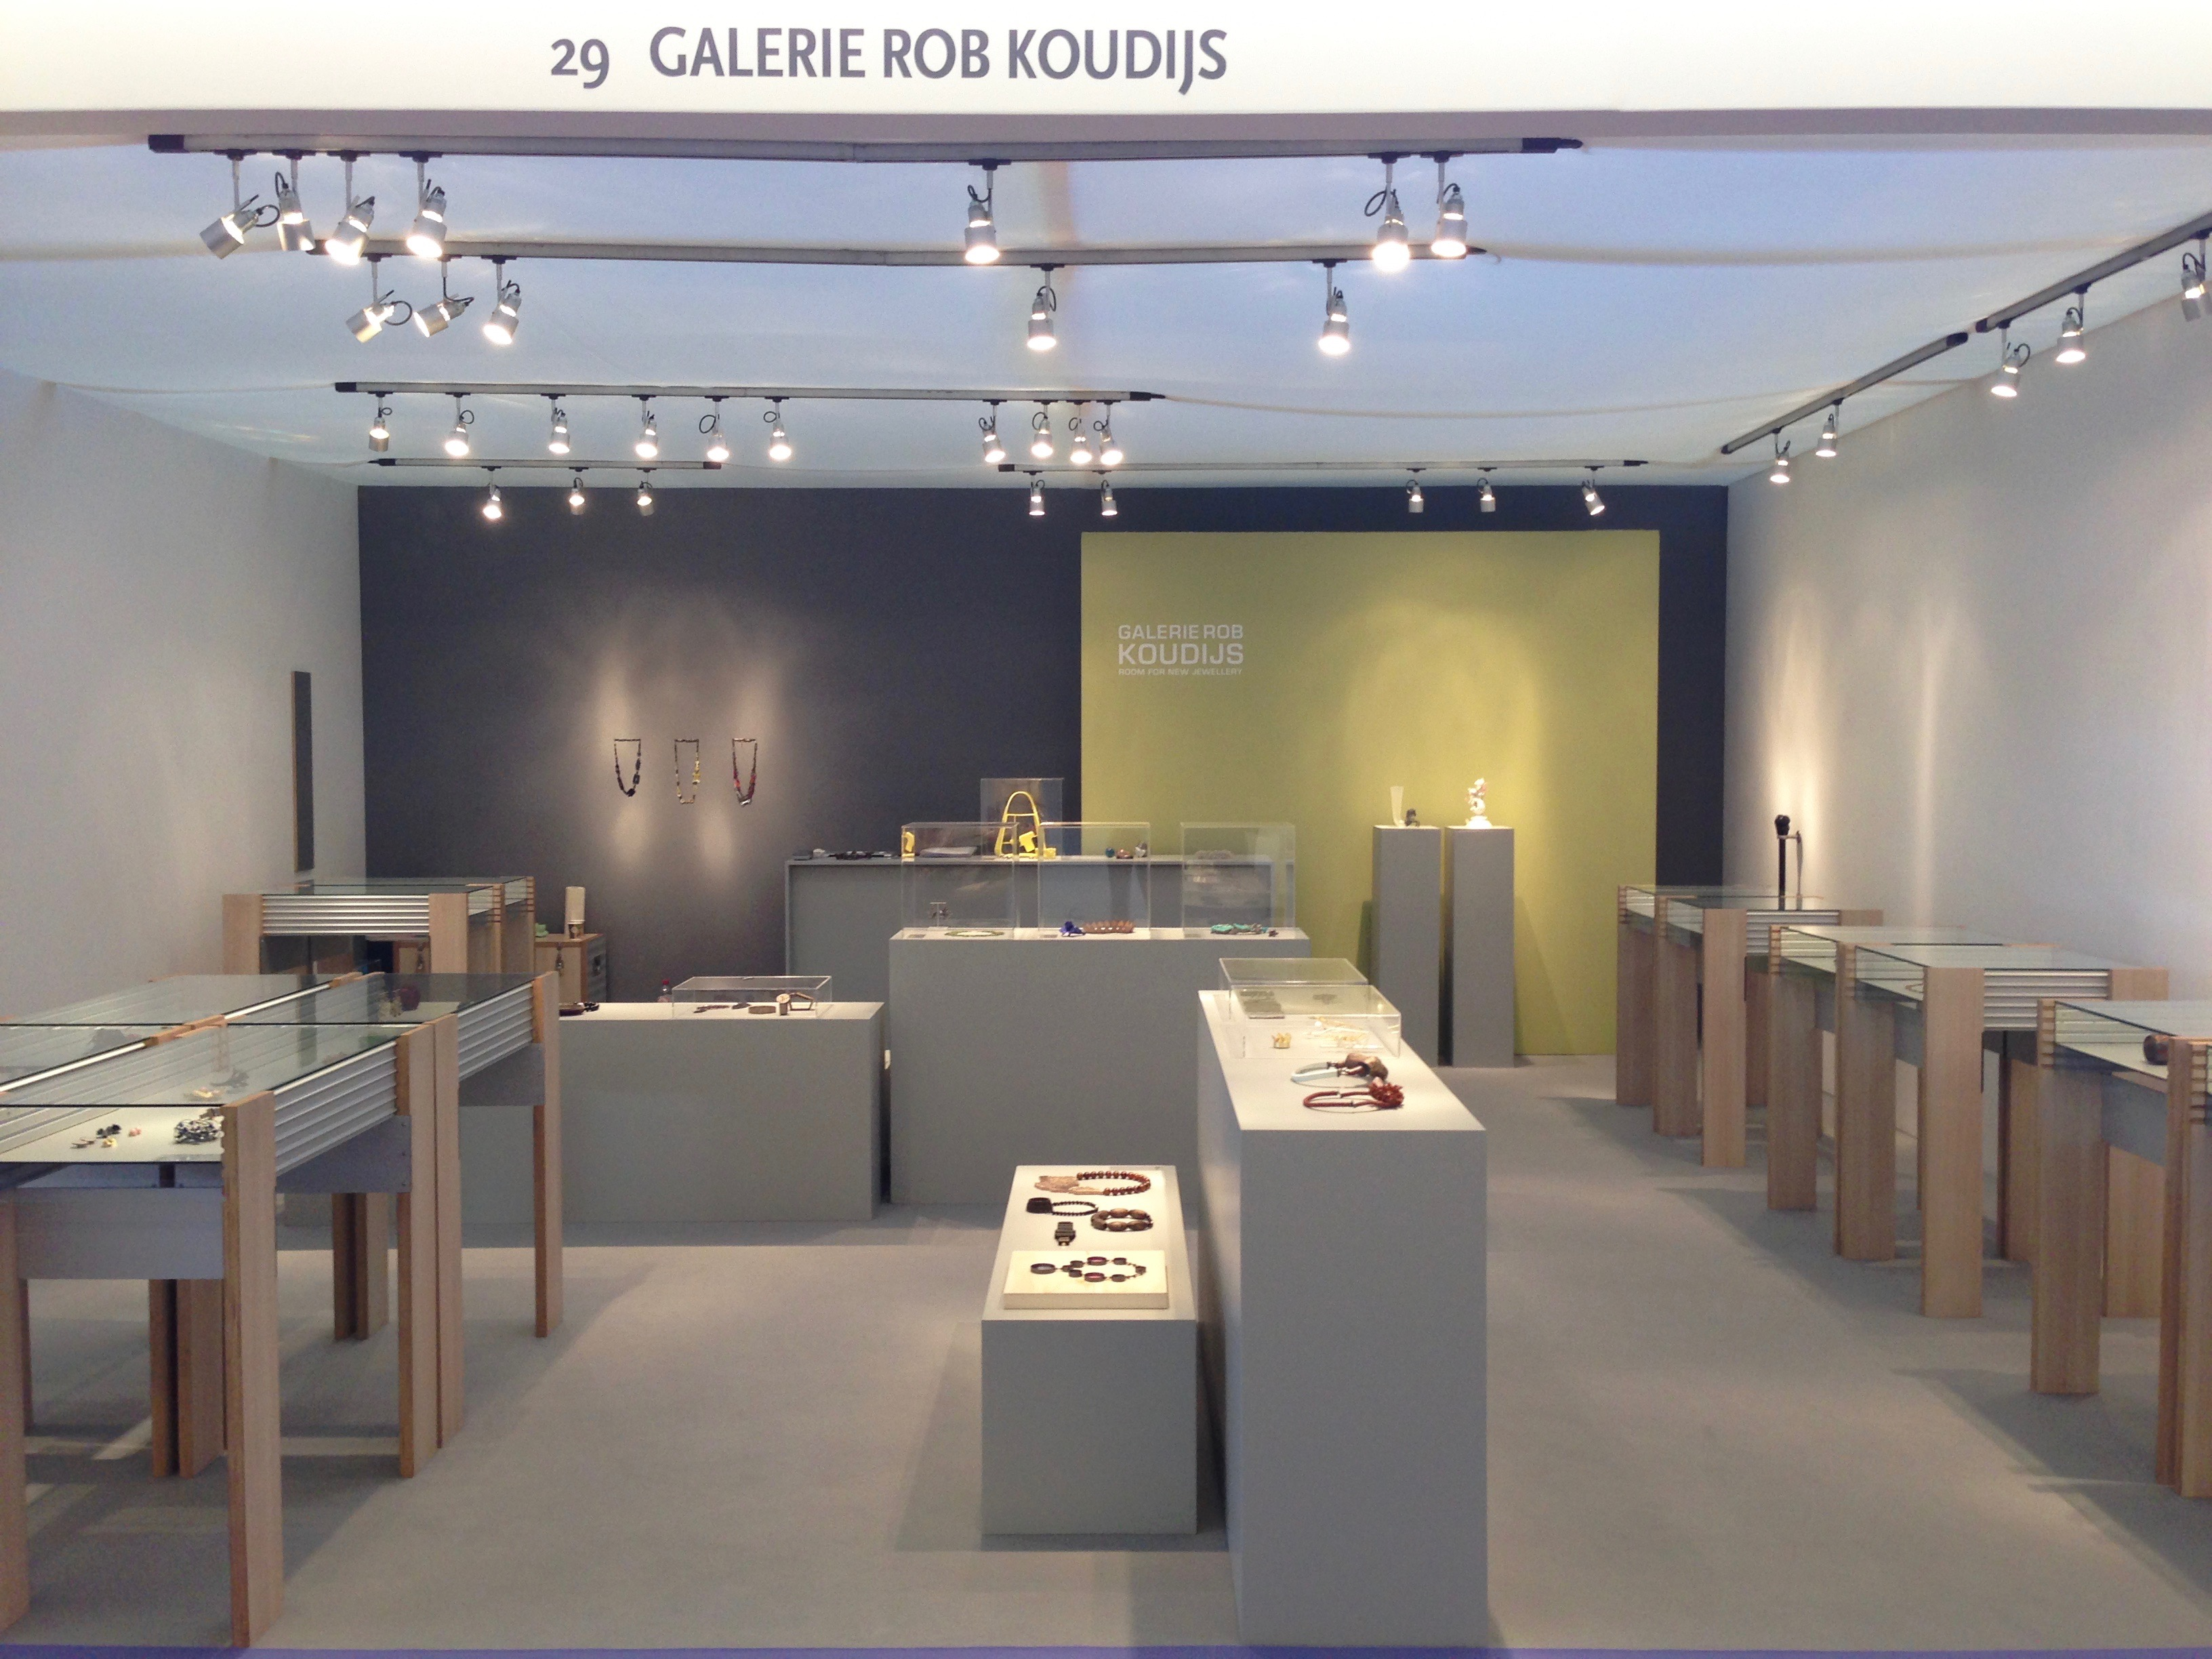 Galerie Rob Koudijs op PAN, 2015, beurs, Amsterdam, RAI